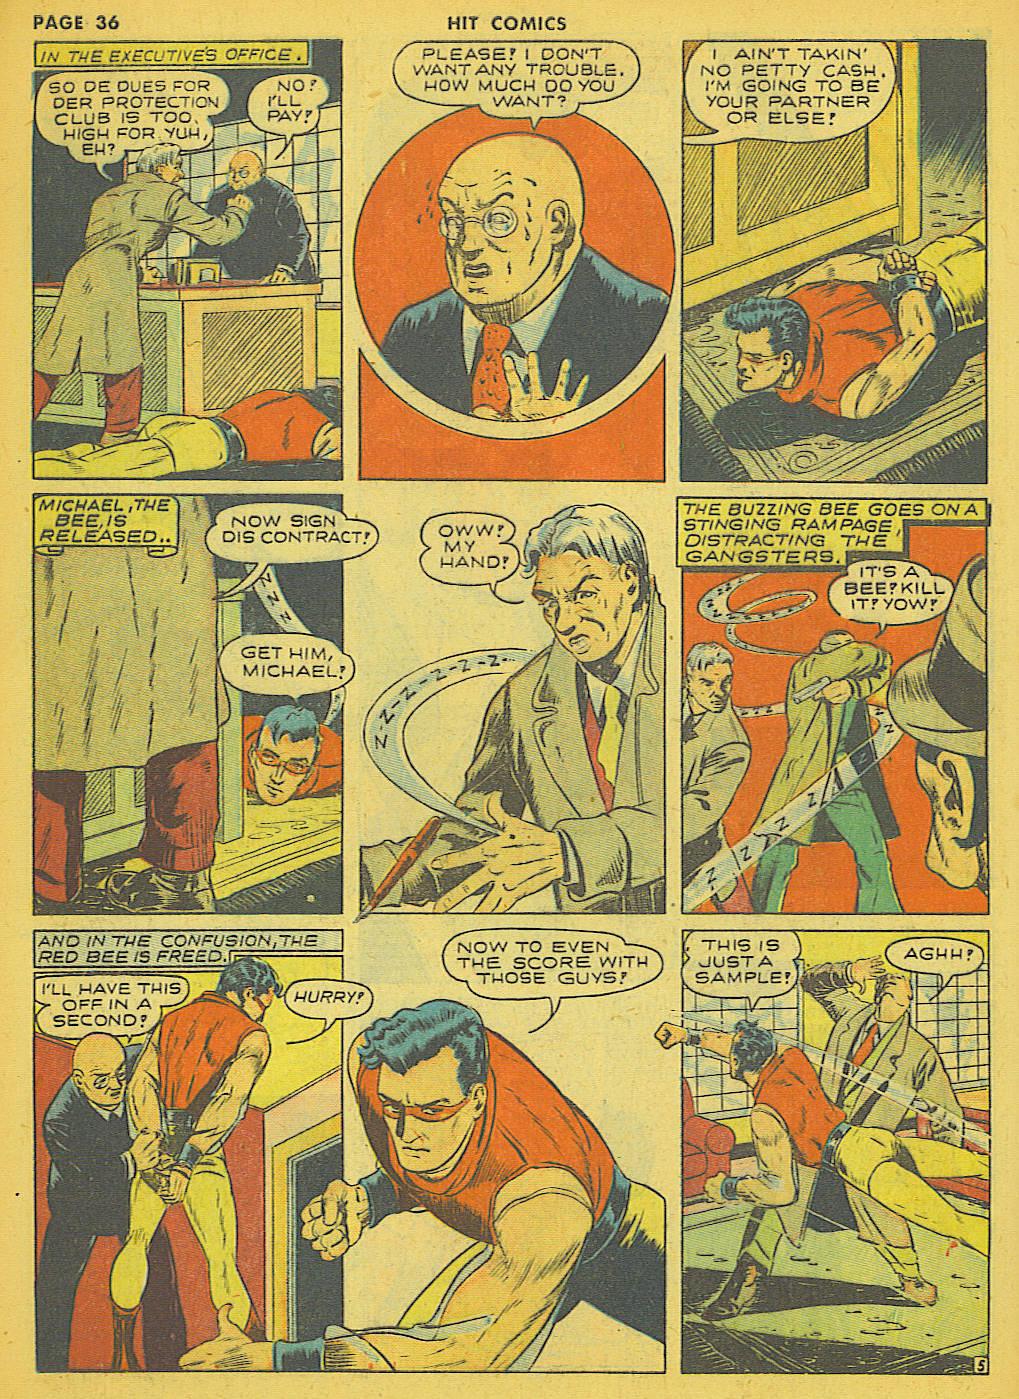 Read online Hit Comics comic -  Issue #21 - 38